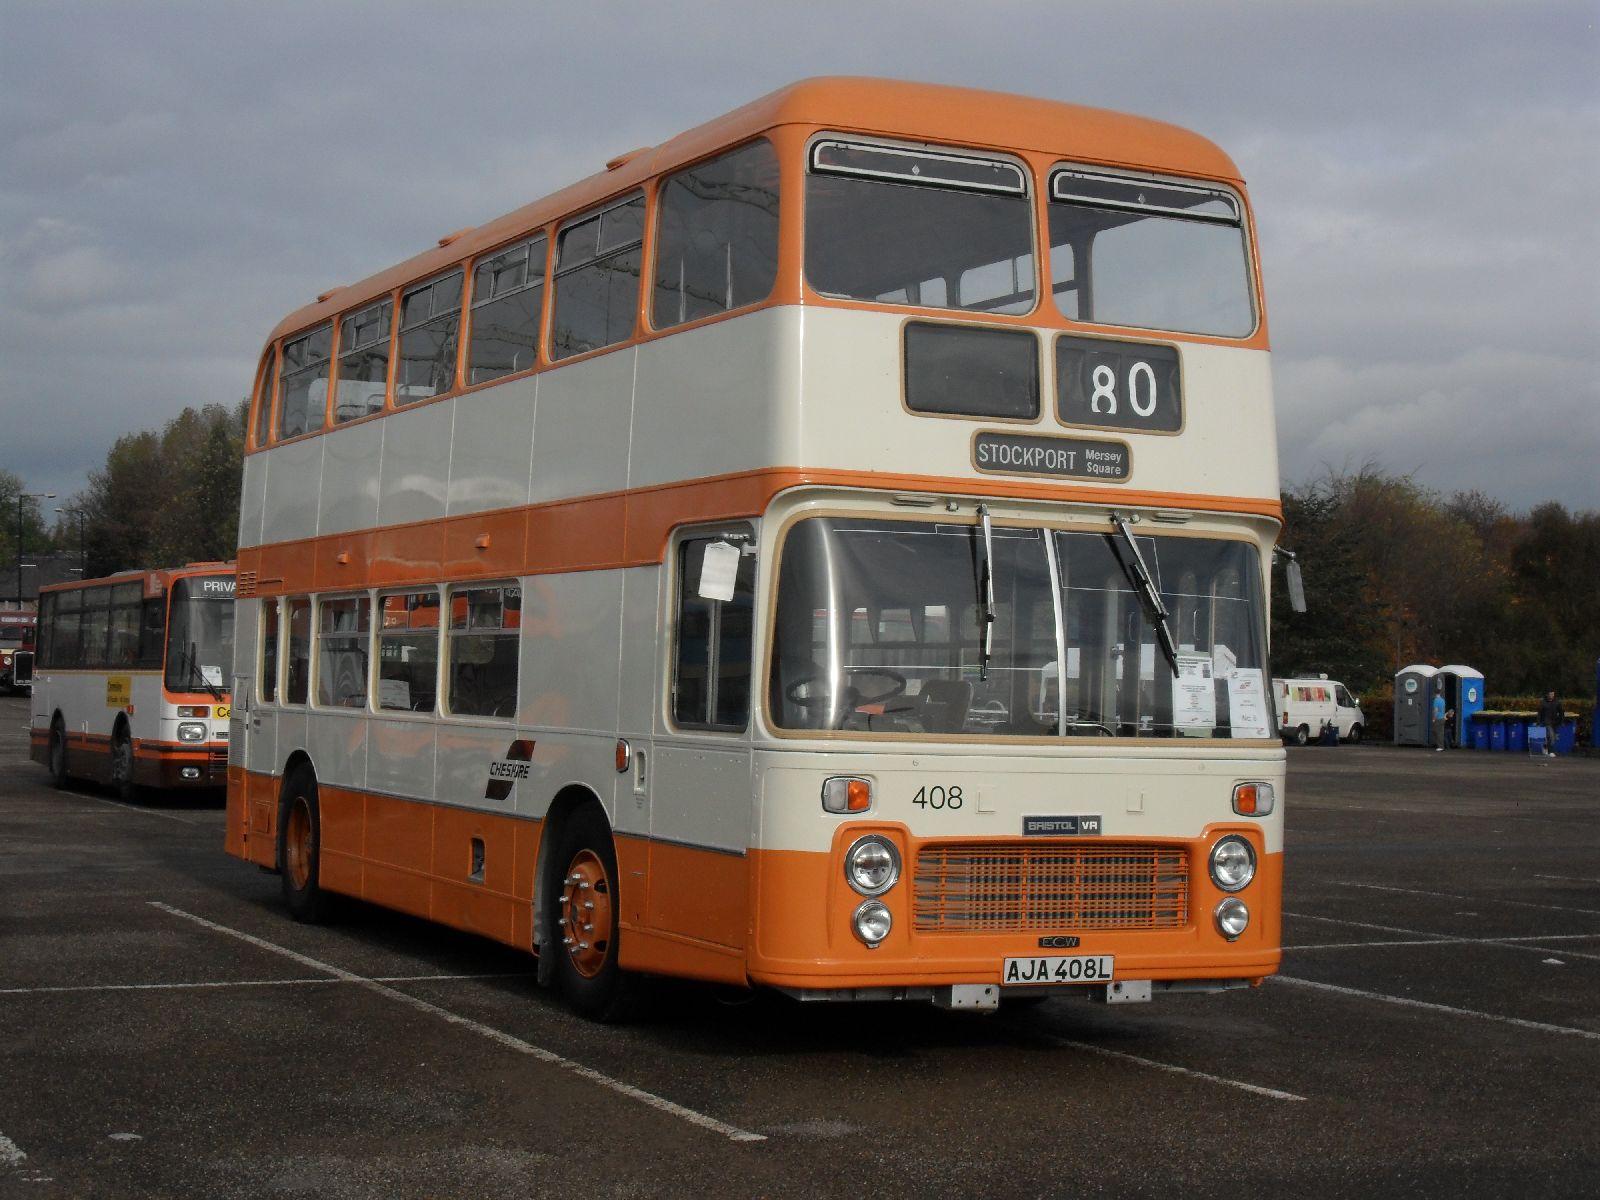 File:SELNEC bus 408 (AJA 408L), SELNEC 40 rally jpg